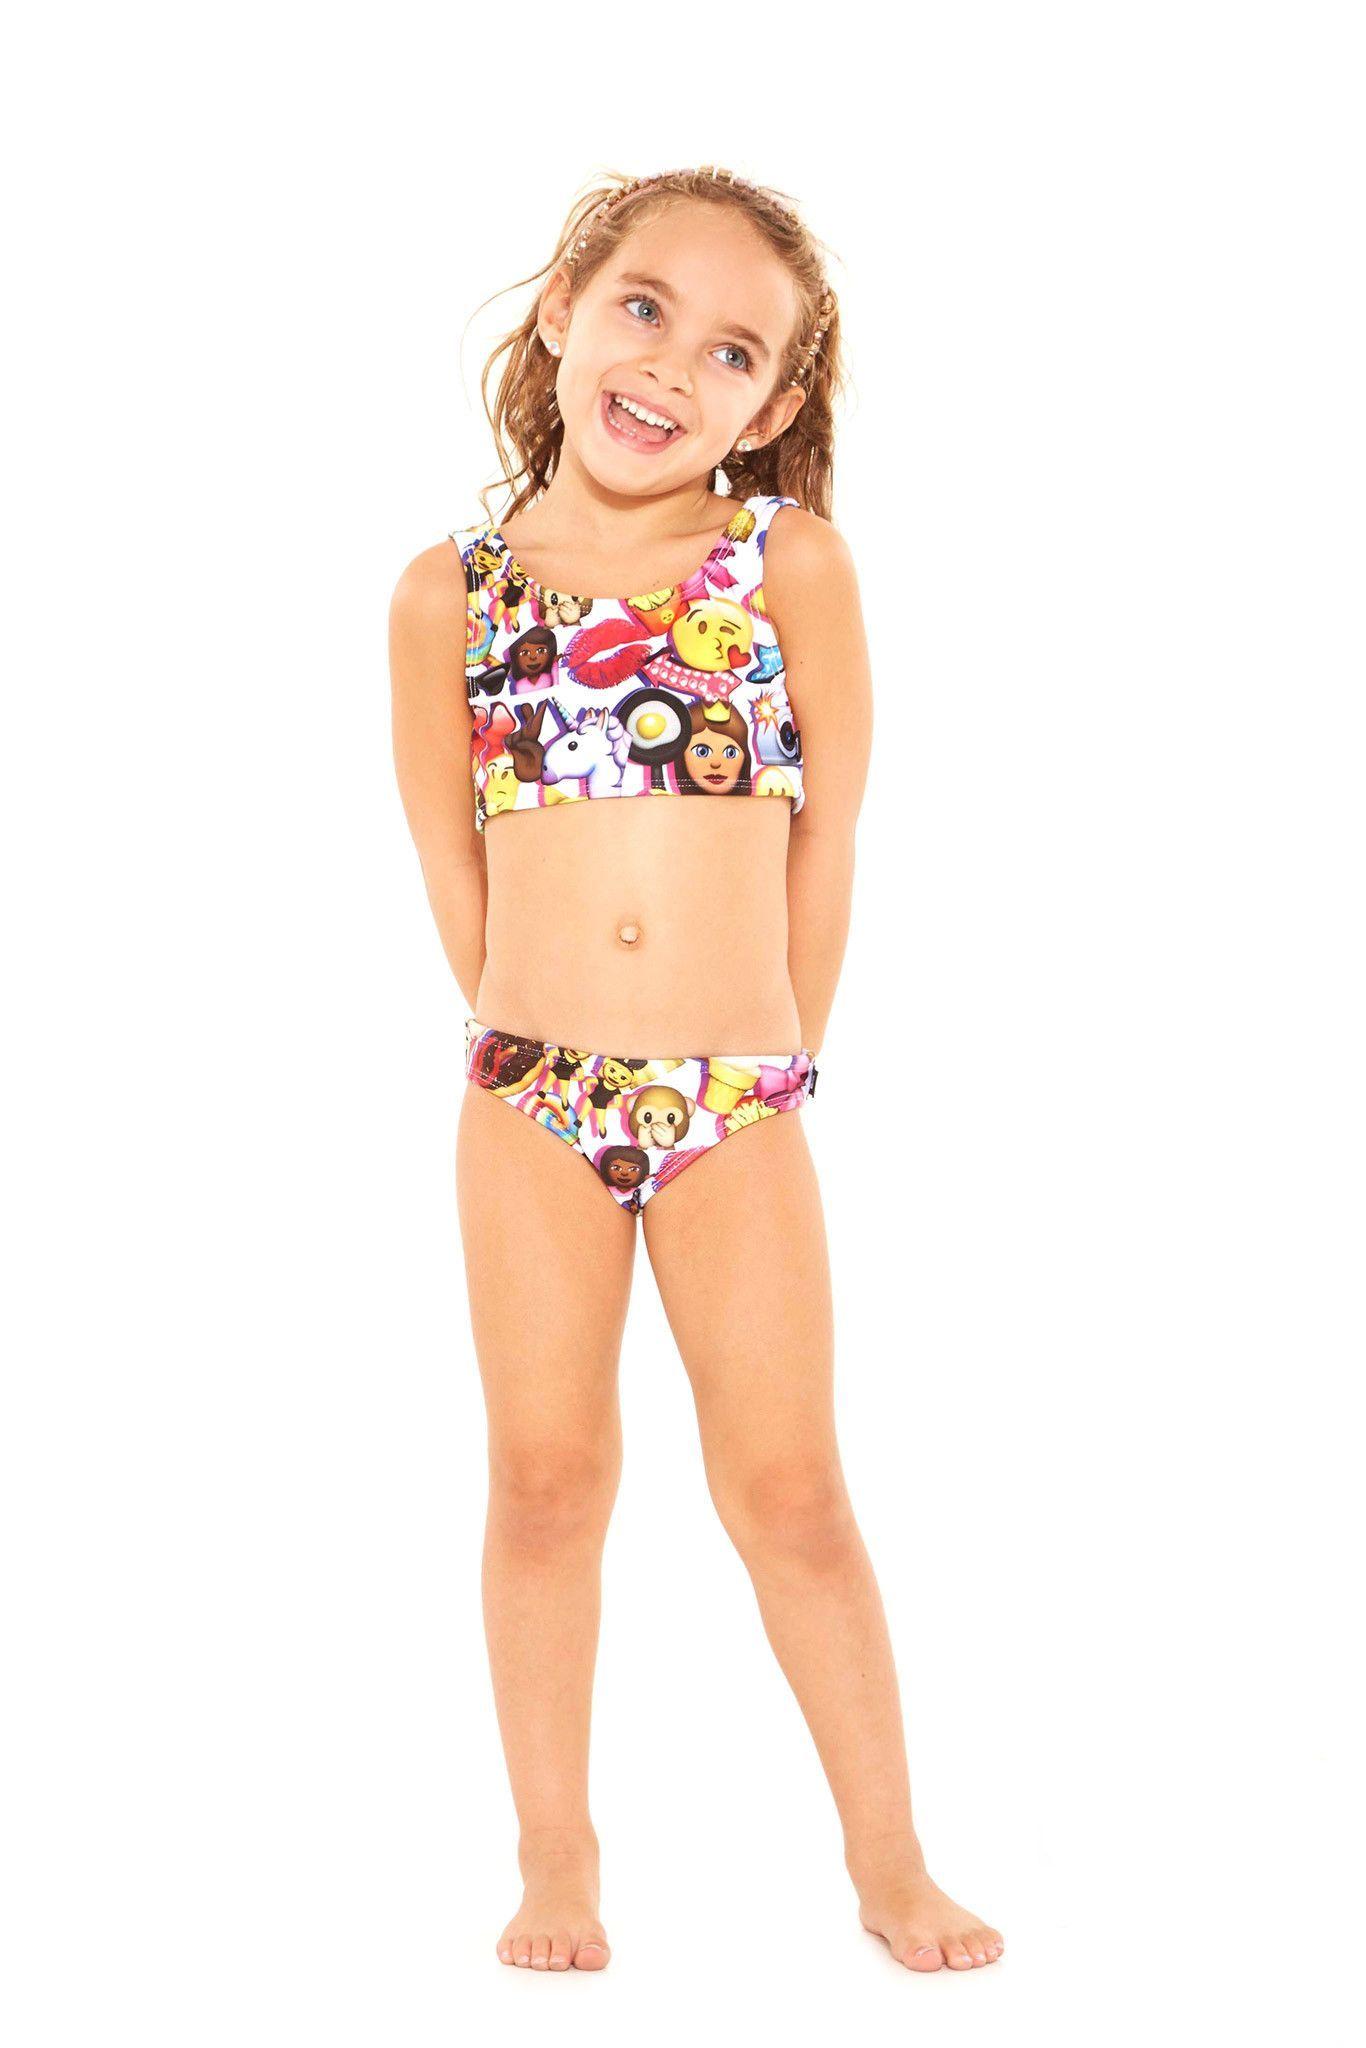 d2610aea700 Kids 100% Emoji Sports Bra Bikini | sports bras | Sports bra bikini ...